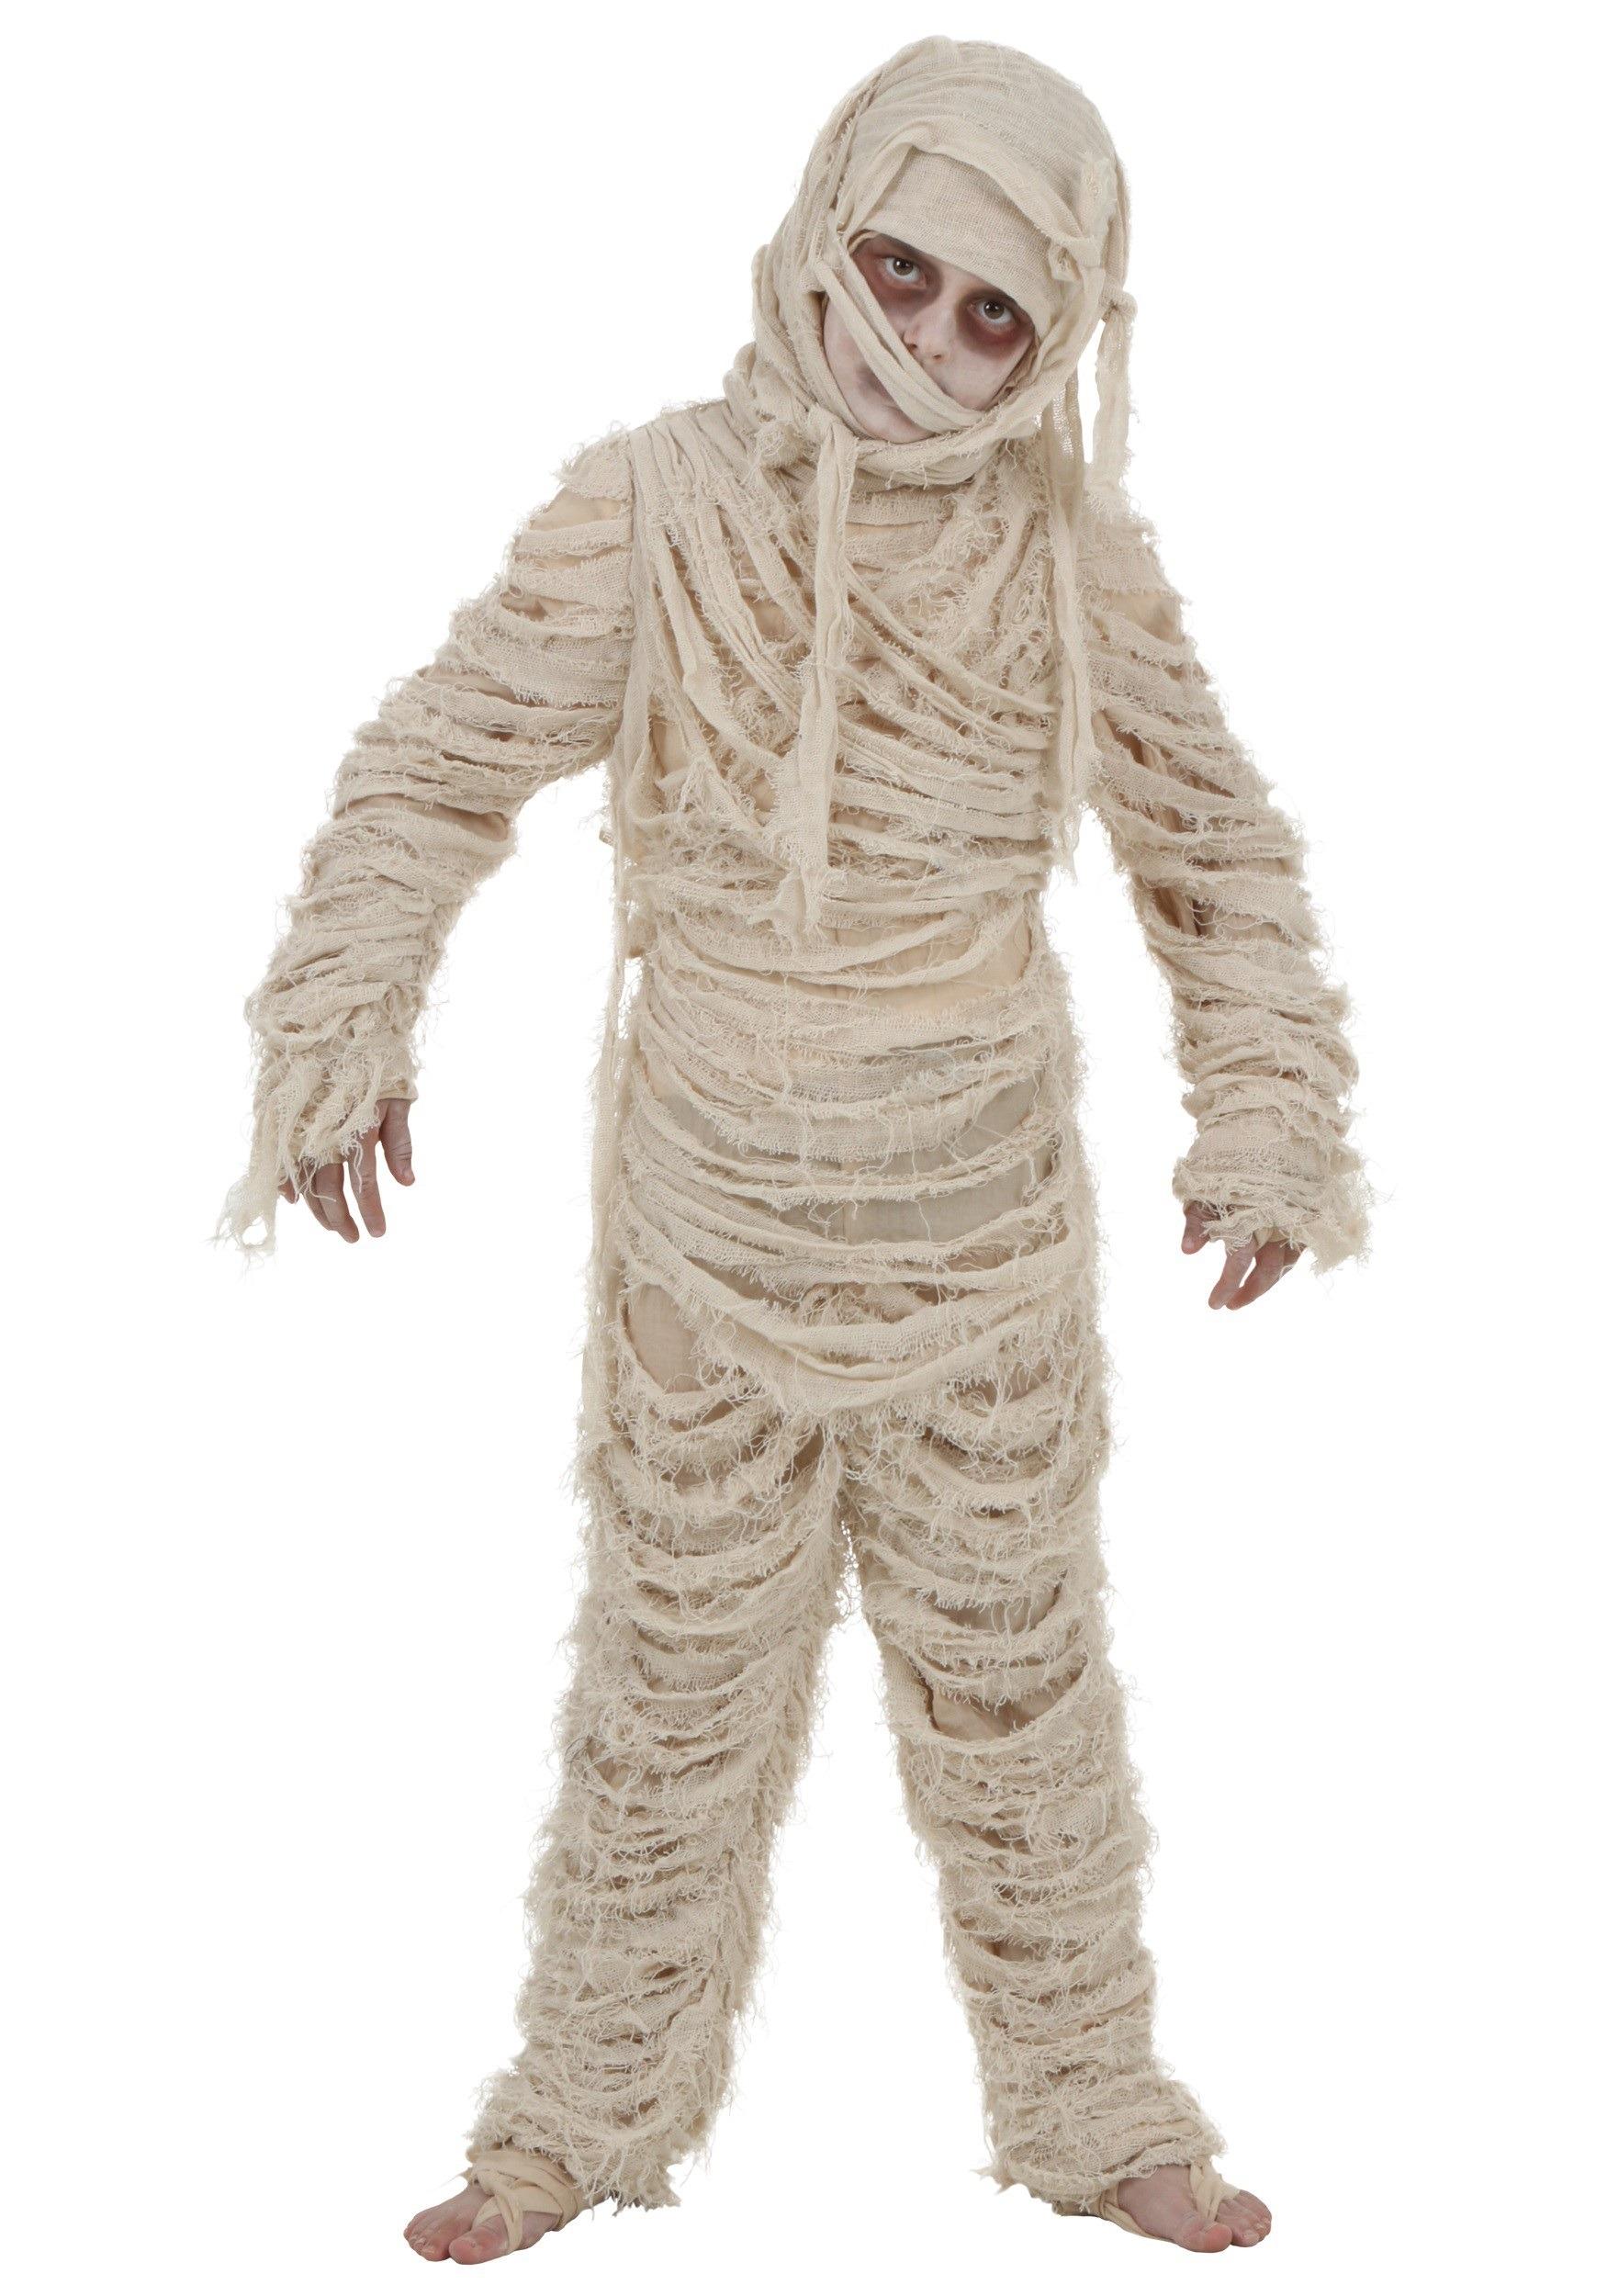 Mummy Costume for Boys   Original Halloween Costume